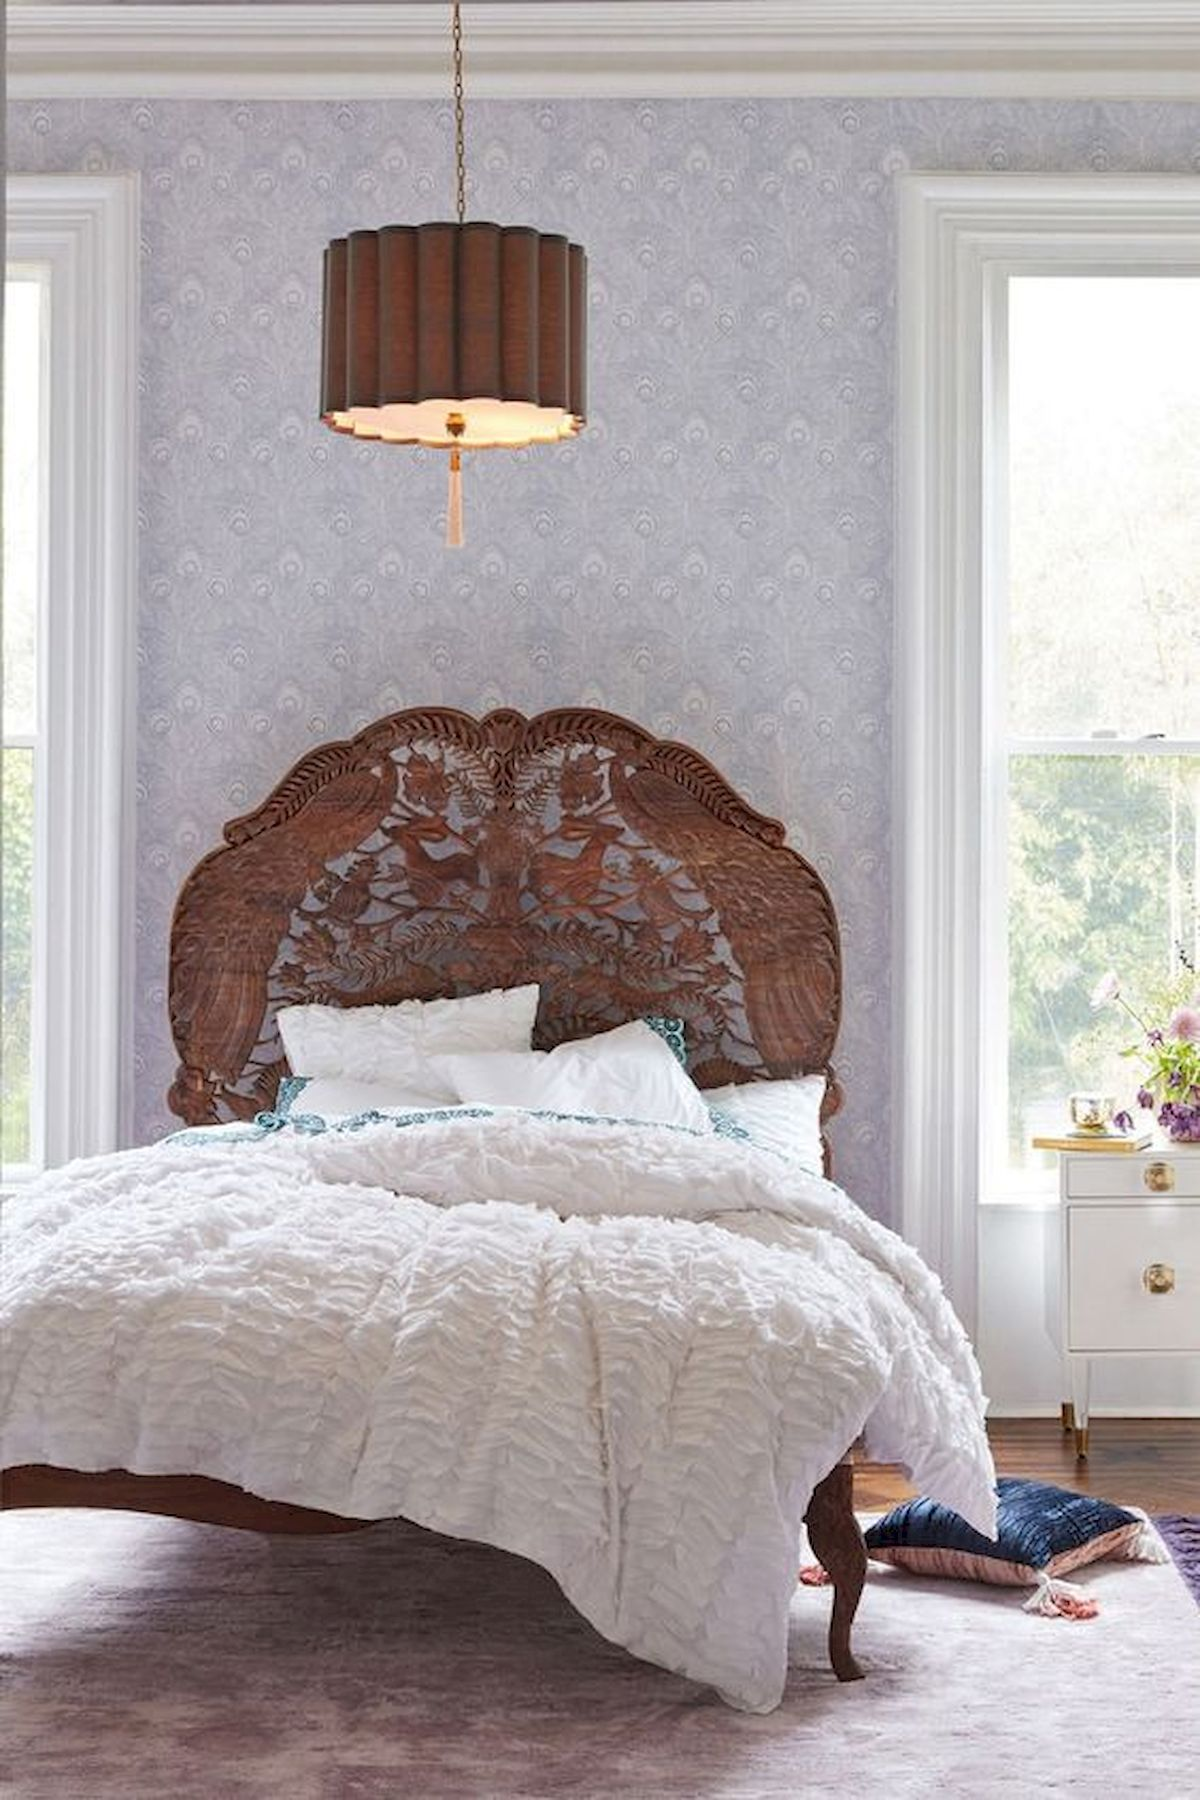 40 Amazing Farmhouse Boho Bedroom Design And Decor Ideas (23)